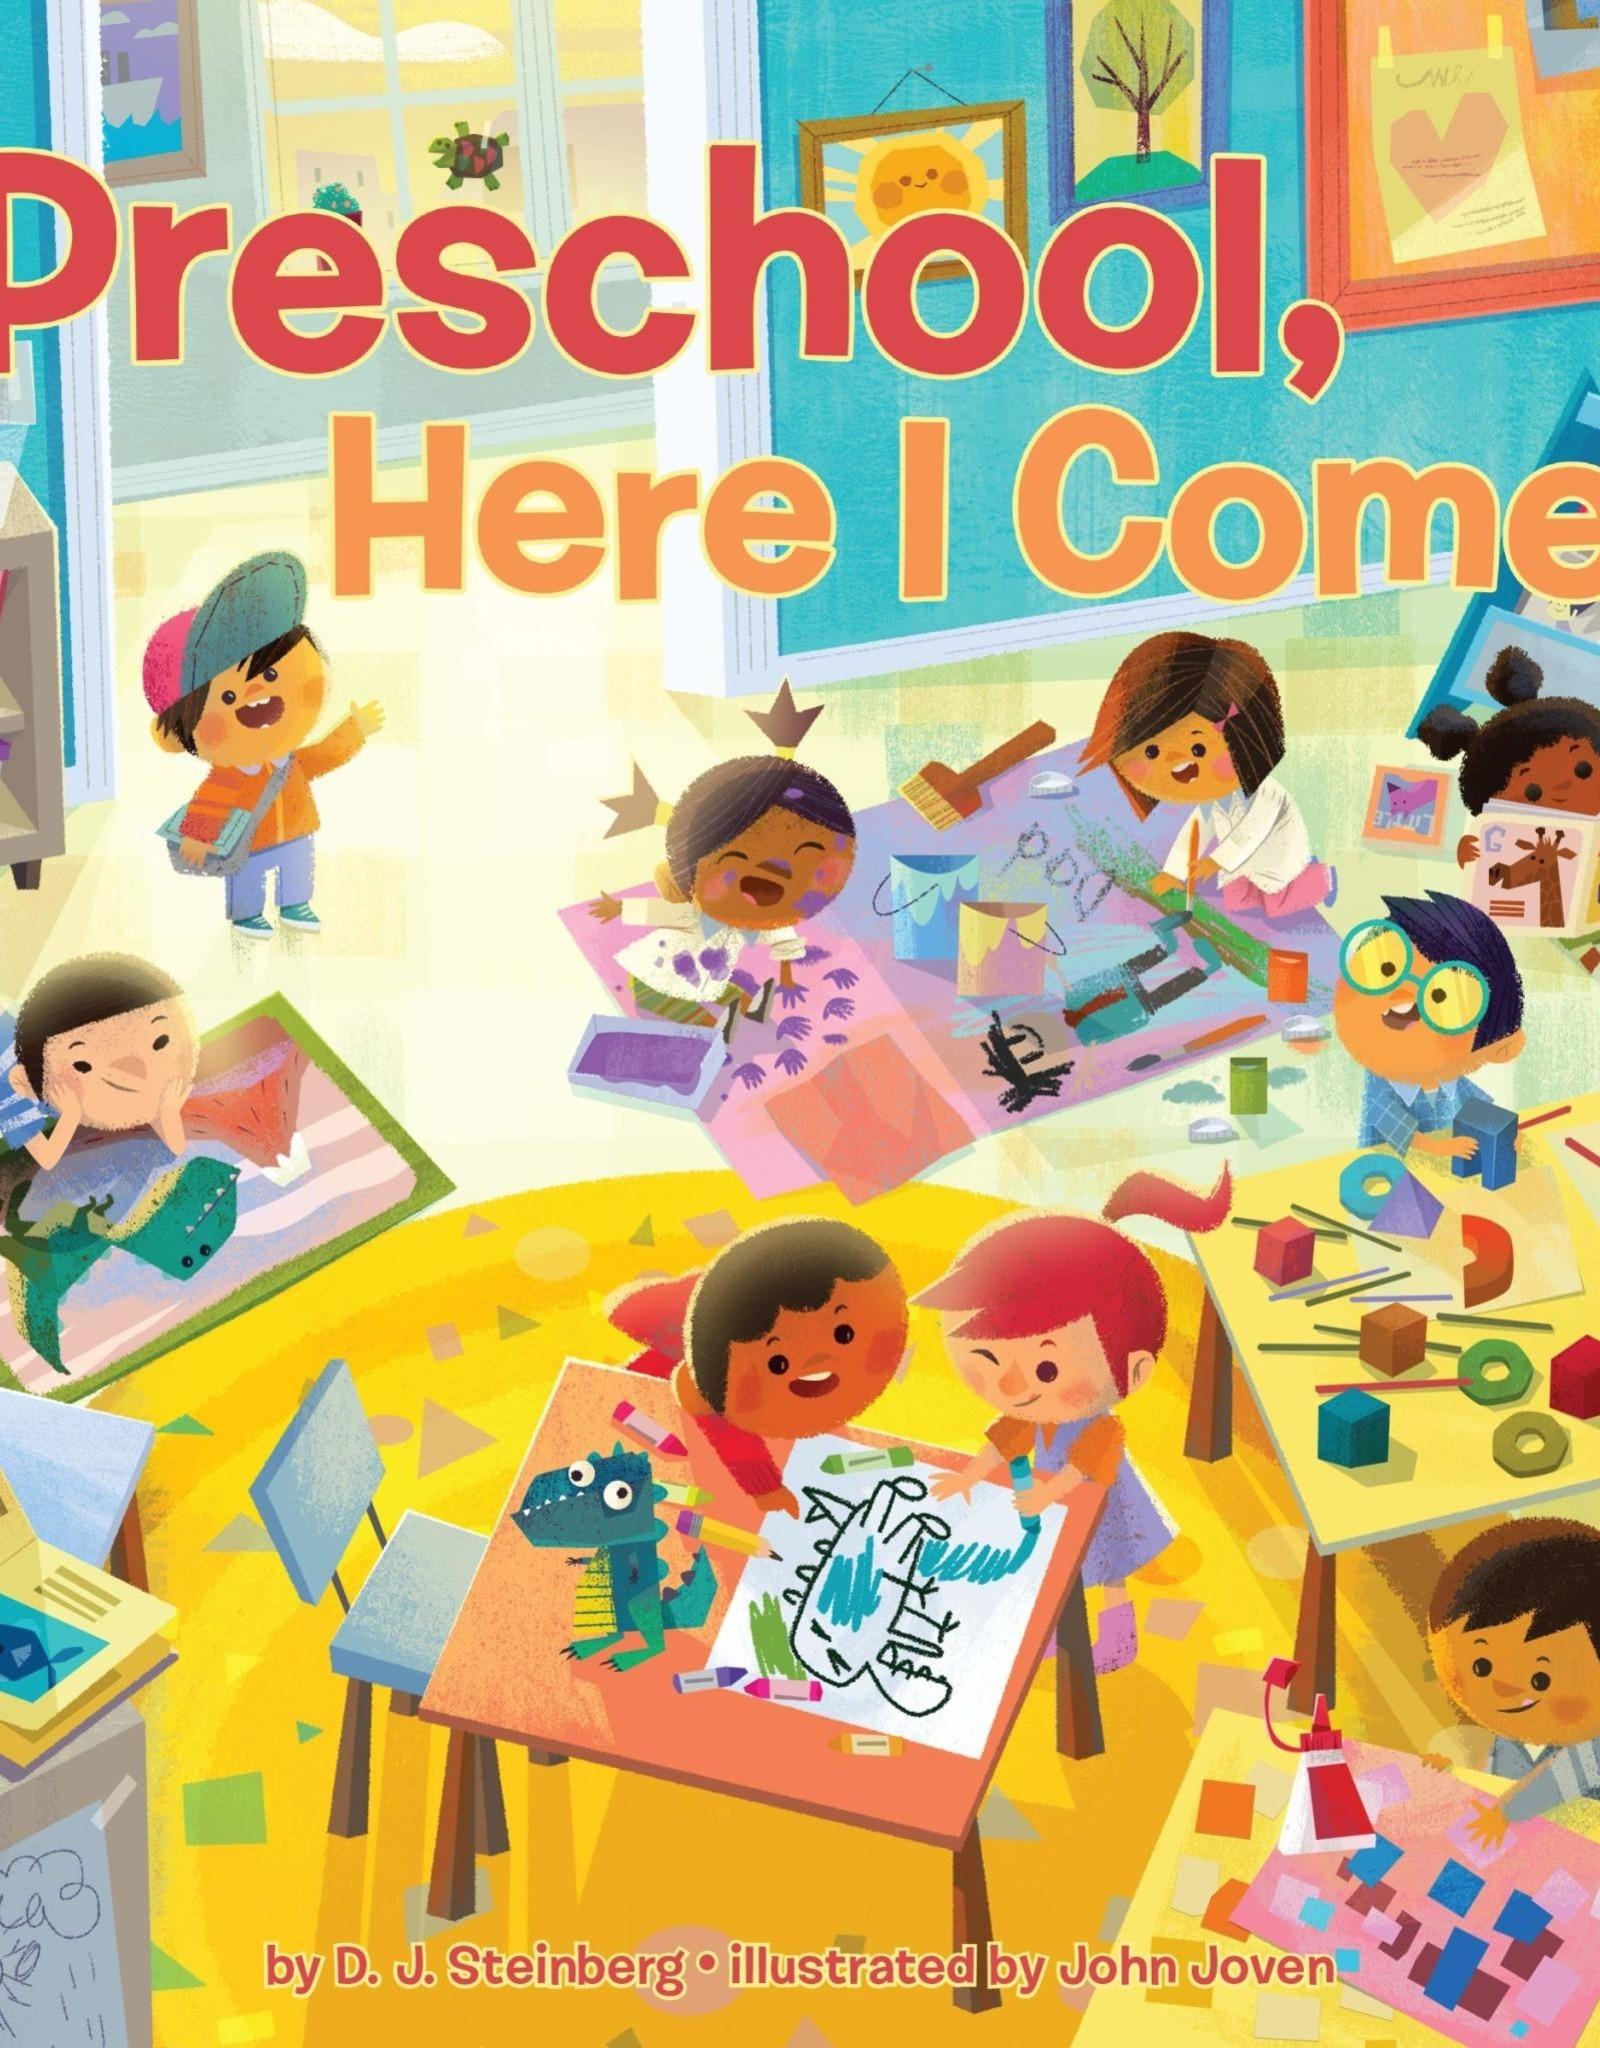 Preschool, Here I Come! (paperback)